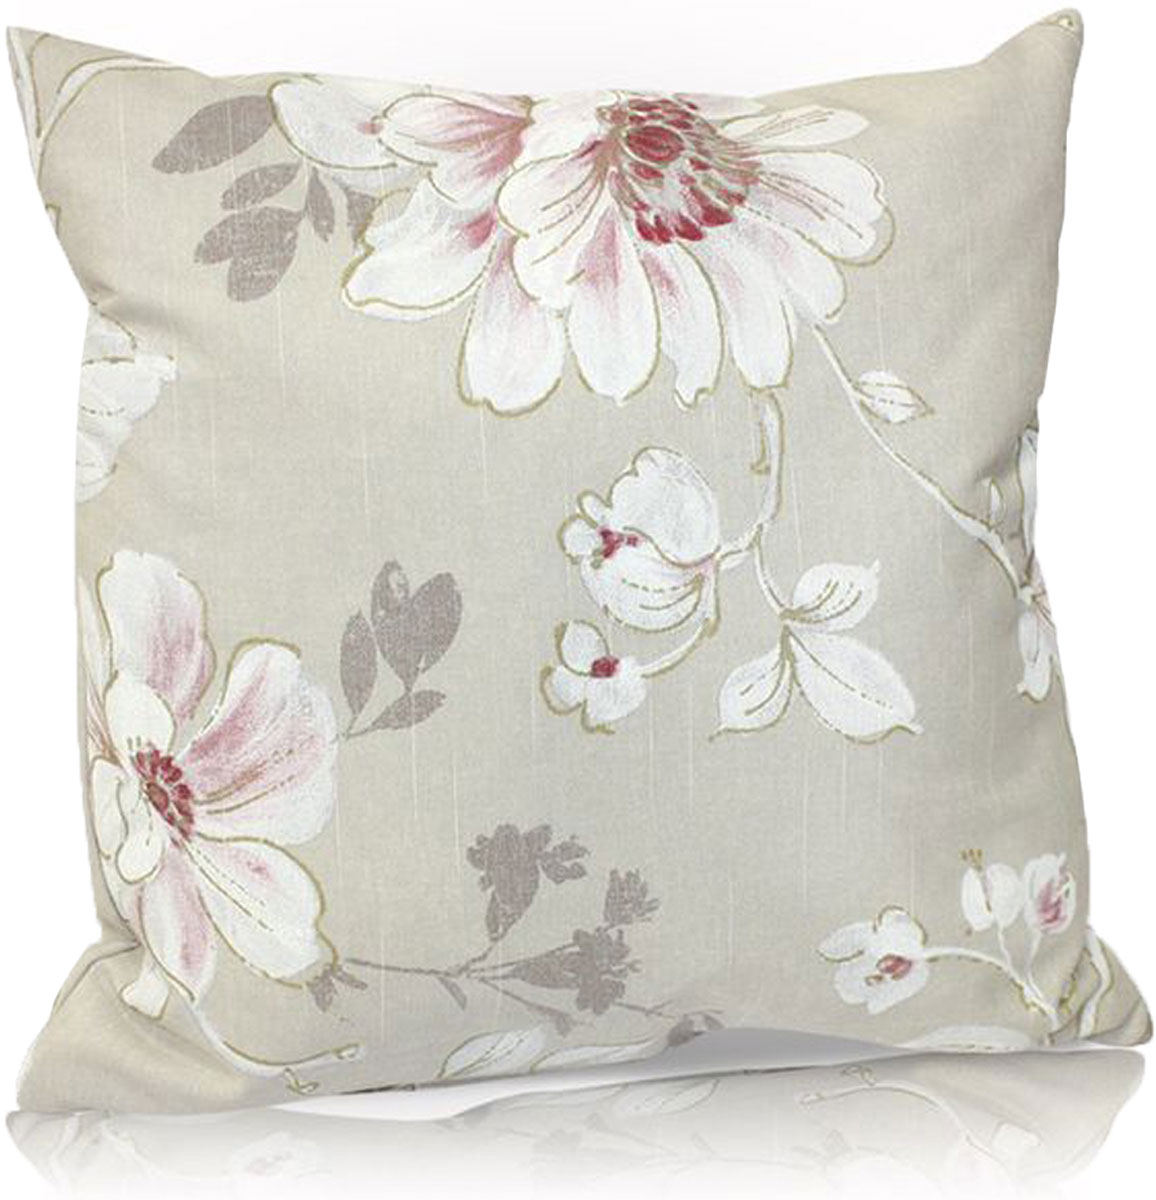 Подушка декоративная KauffOrt Сара, цвет: мультиколор, 40 х 40 см подушка 40 40 см мосальский текстиль цвет мультиколор